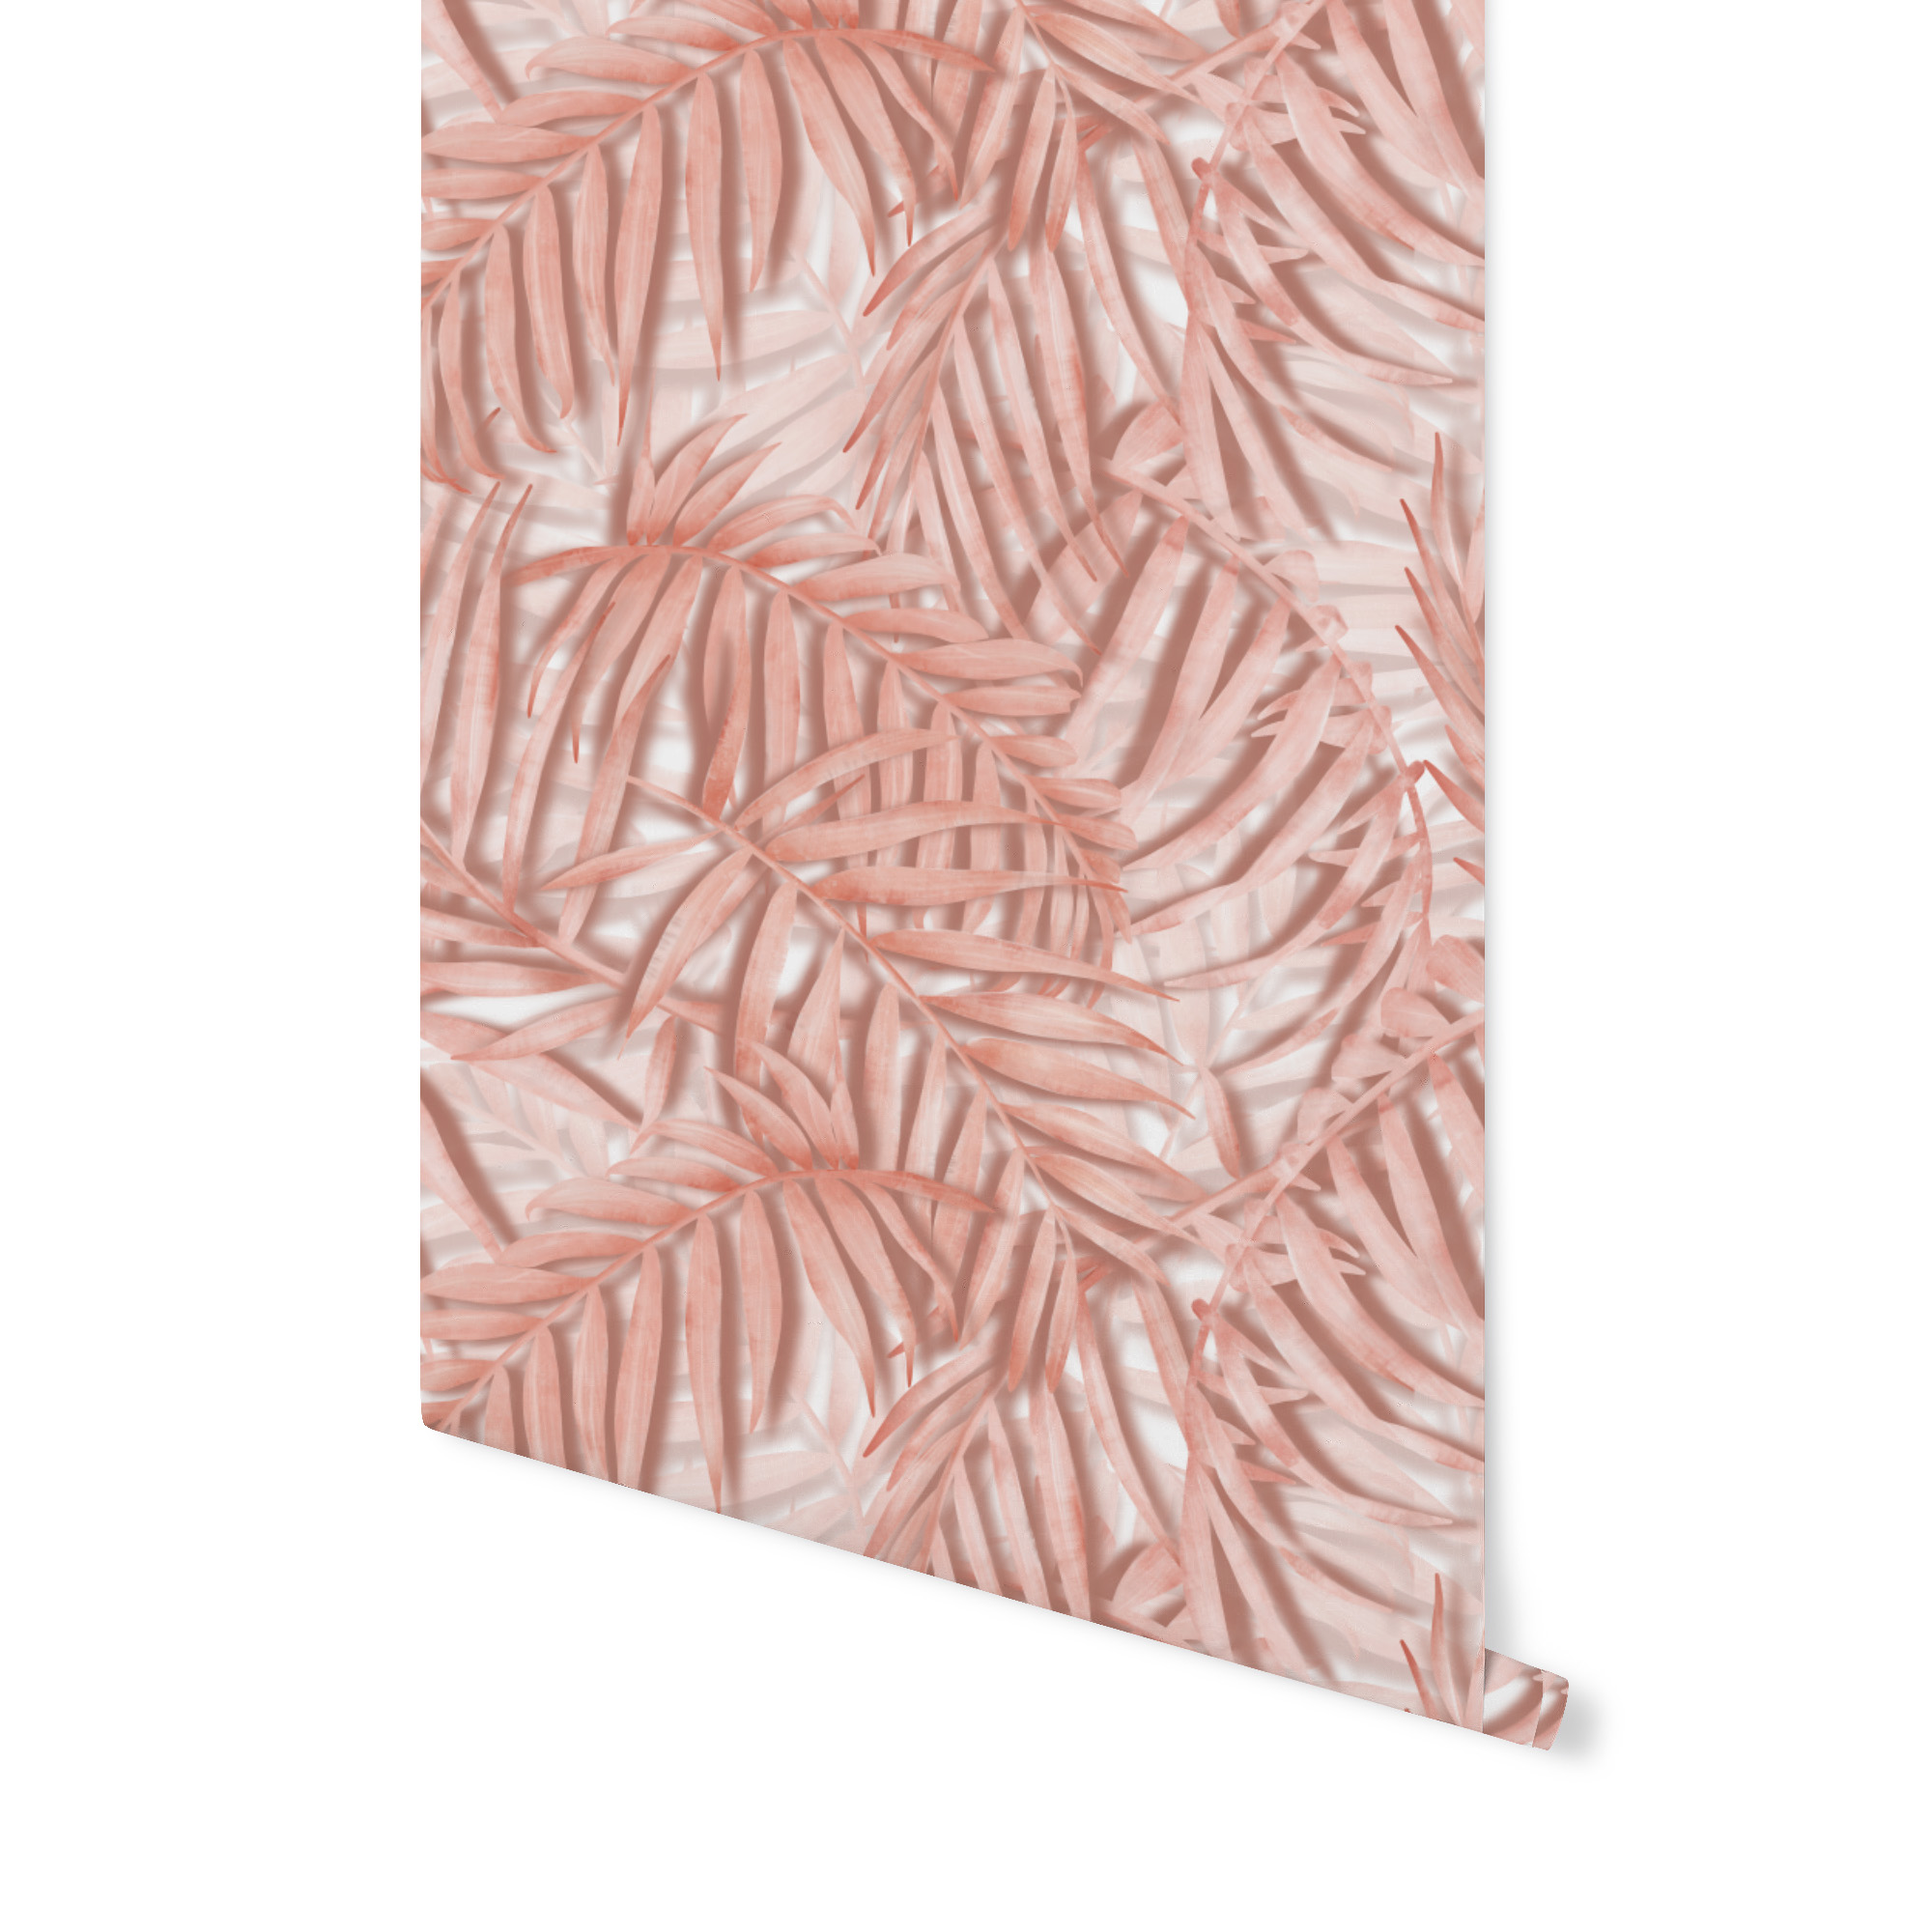 tapeta w palmy, różowa tapeta, różowa palma